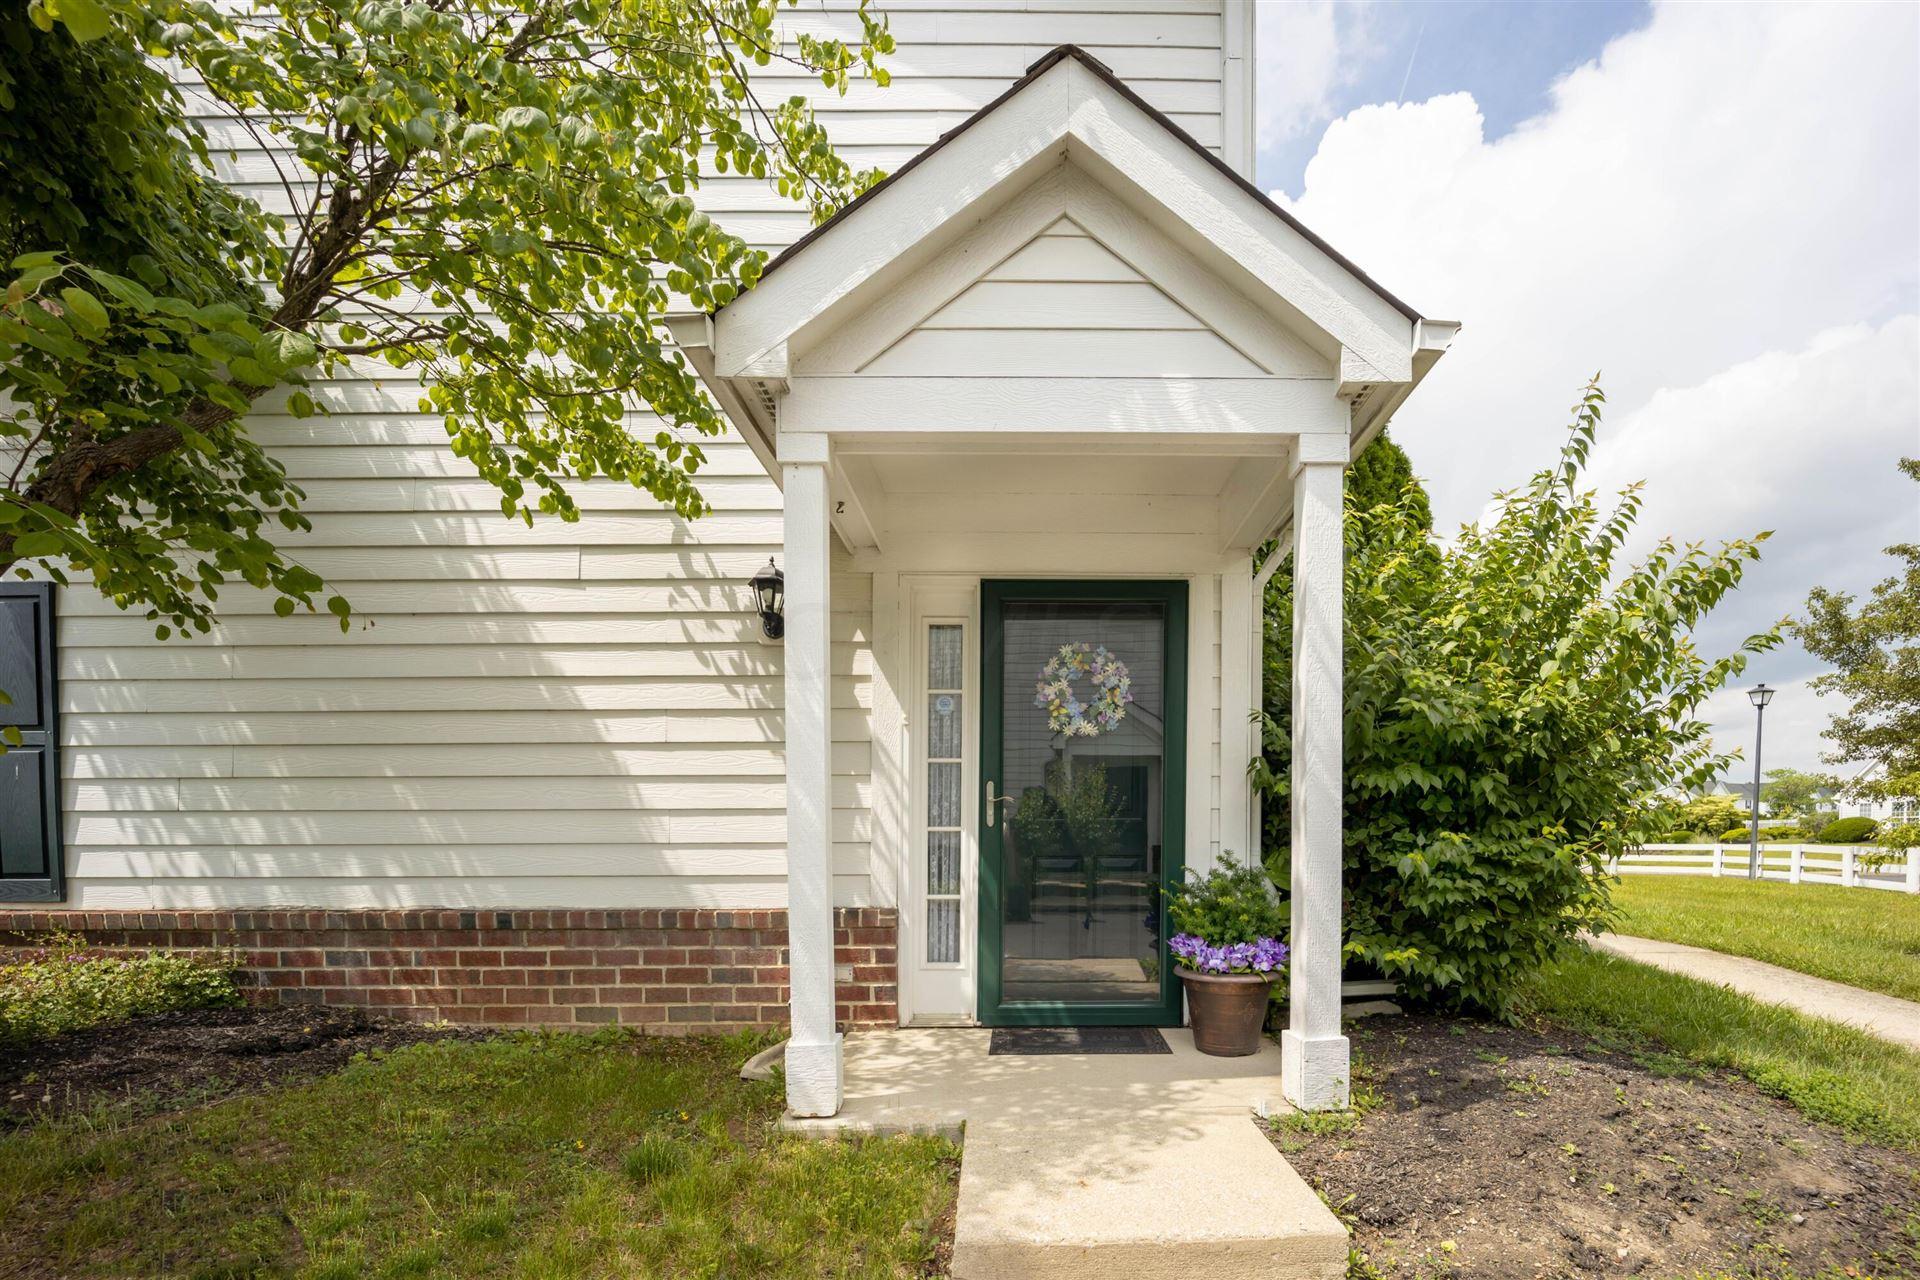 Photo for 6363 Sleepy Meadow Boulevard W, Grove City, OH 43123 (MLS # 221020856)